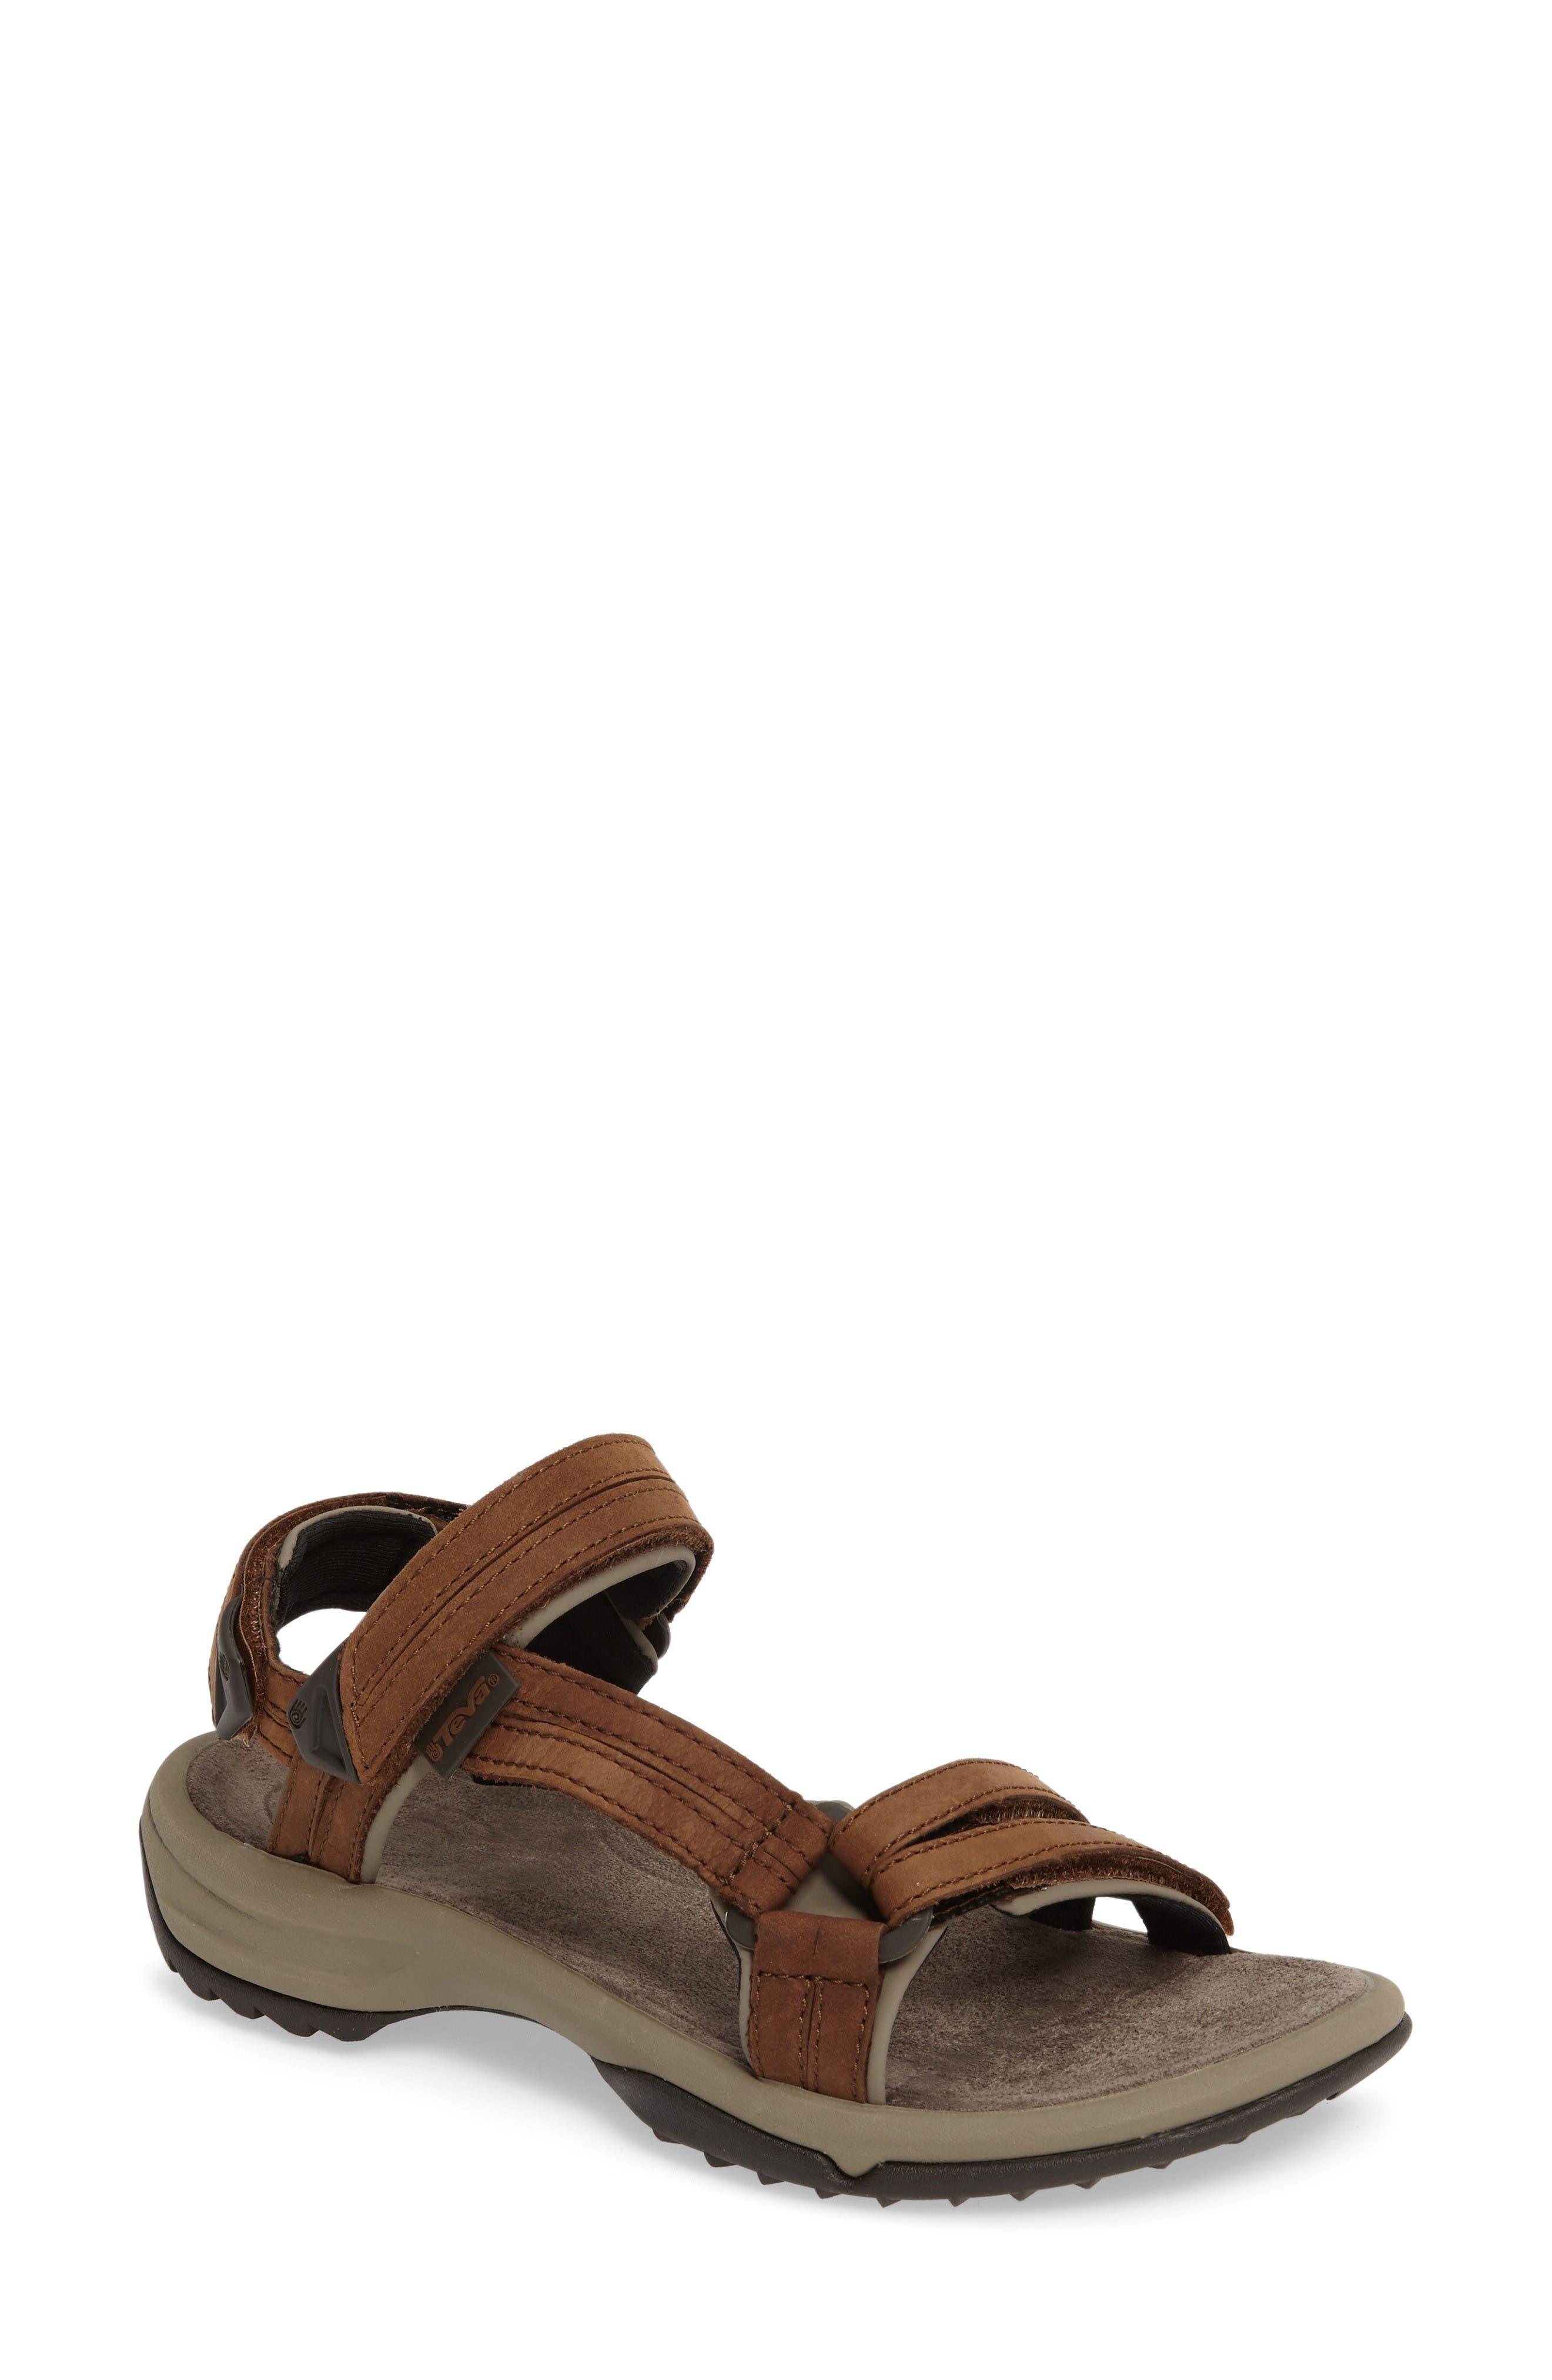 Teva Terra FI Lite Sport Sandal (Women)